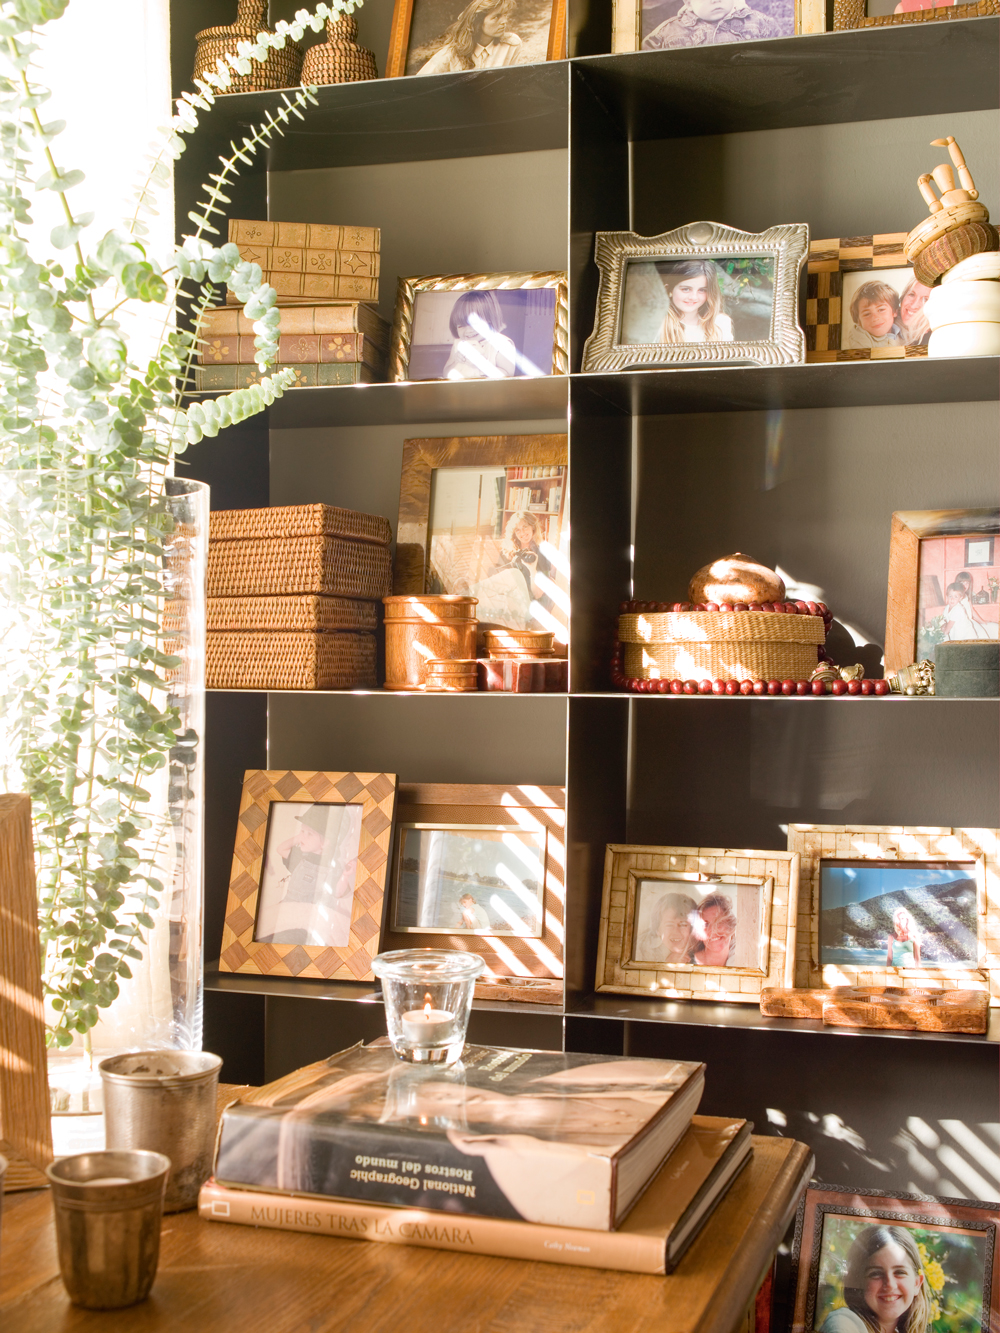 libreria-de-hierro-00397862_79abe3d8.jpg